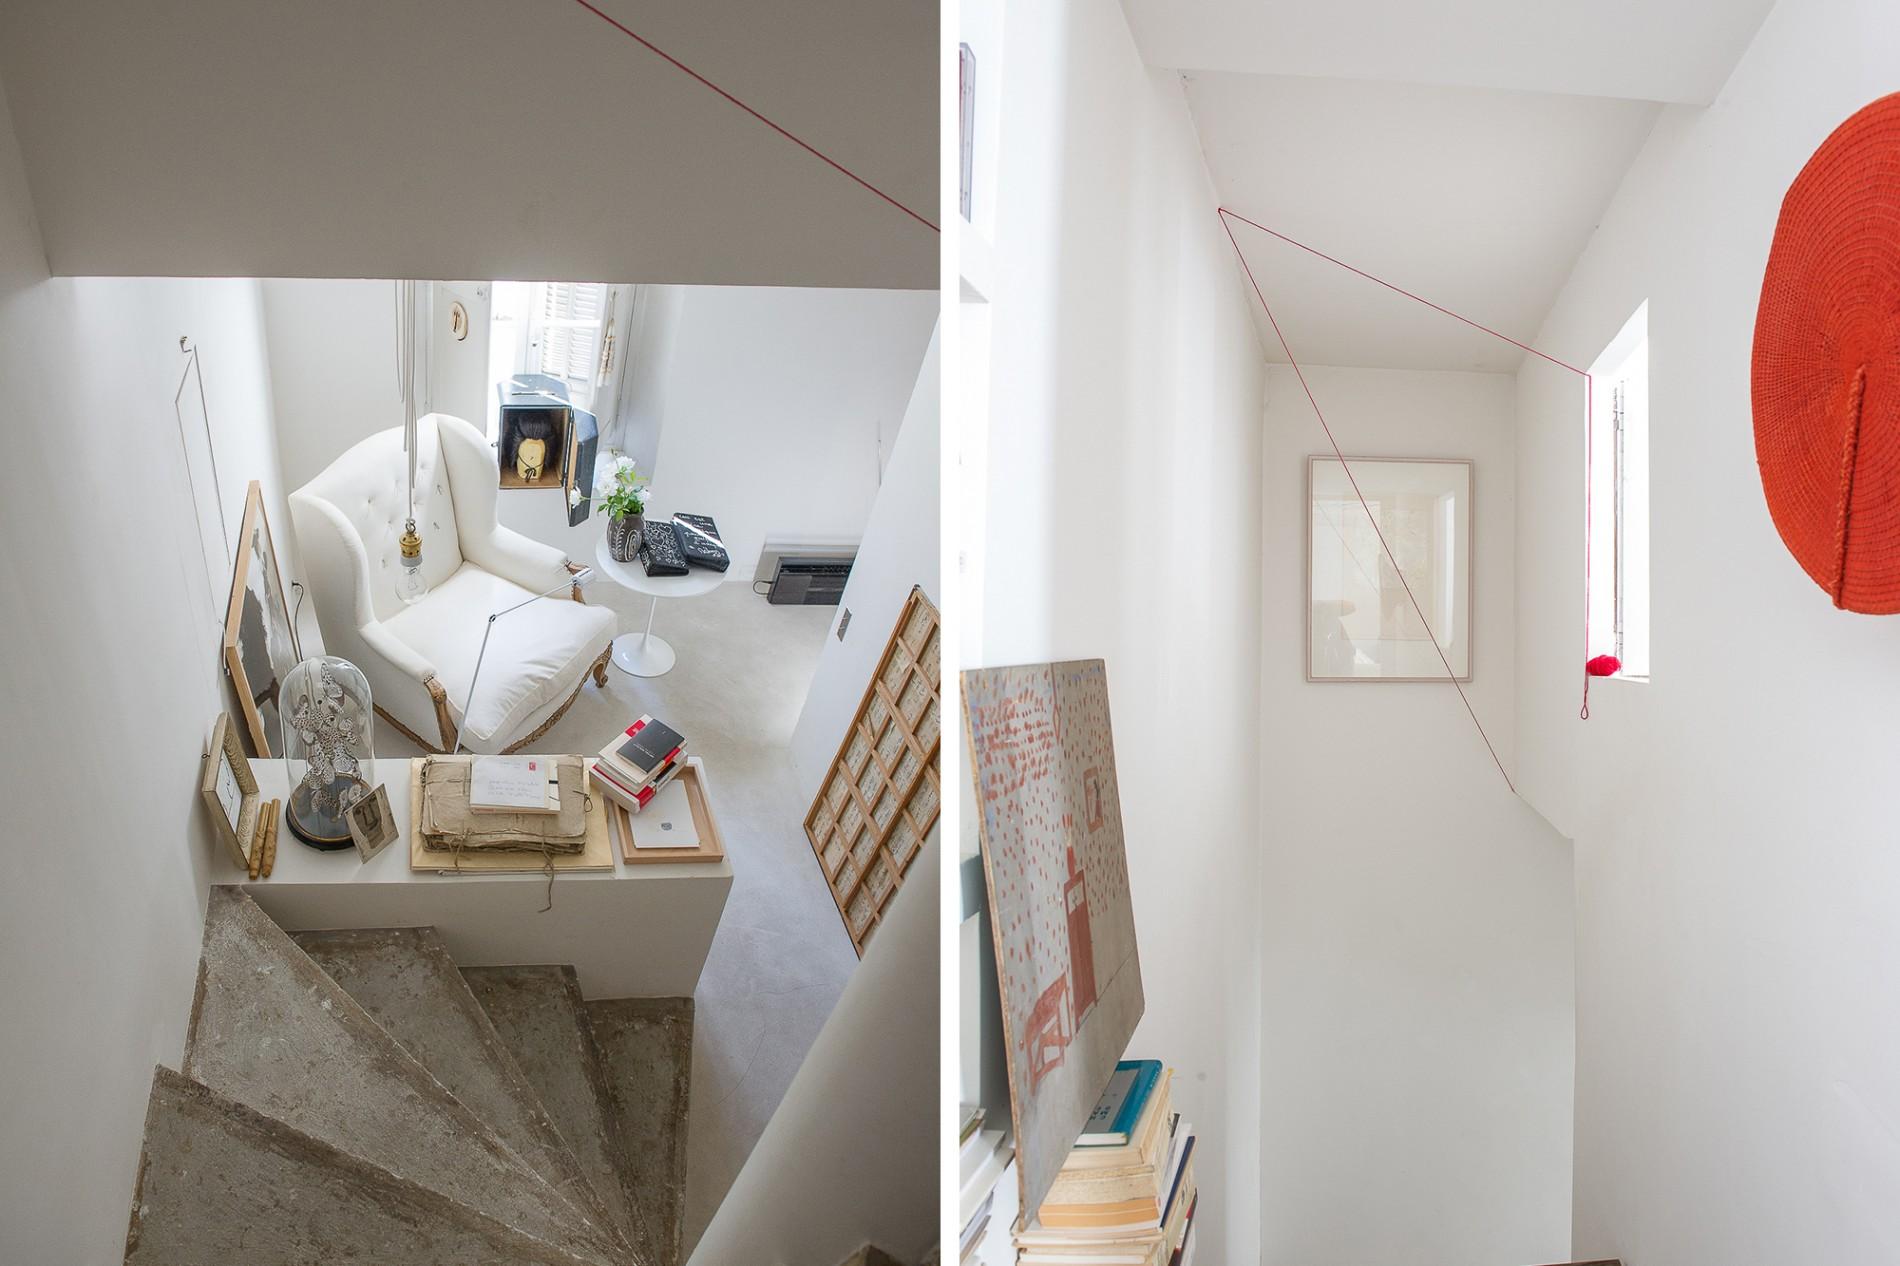 escalier-1900x1266.jpg